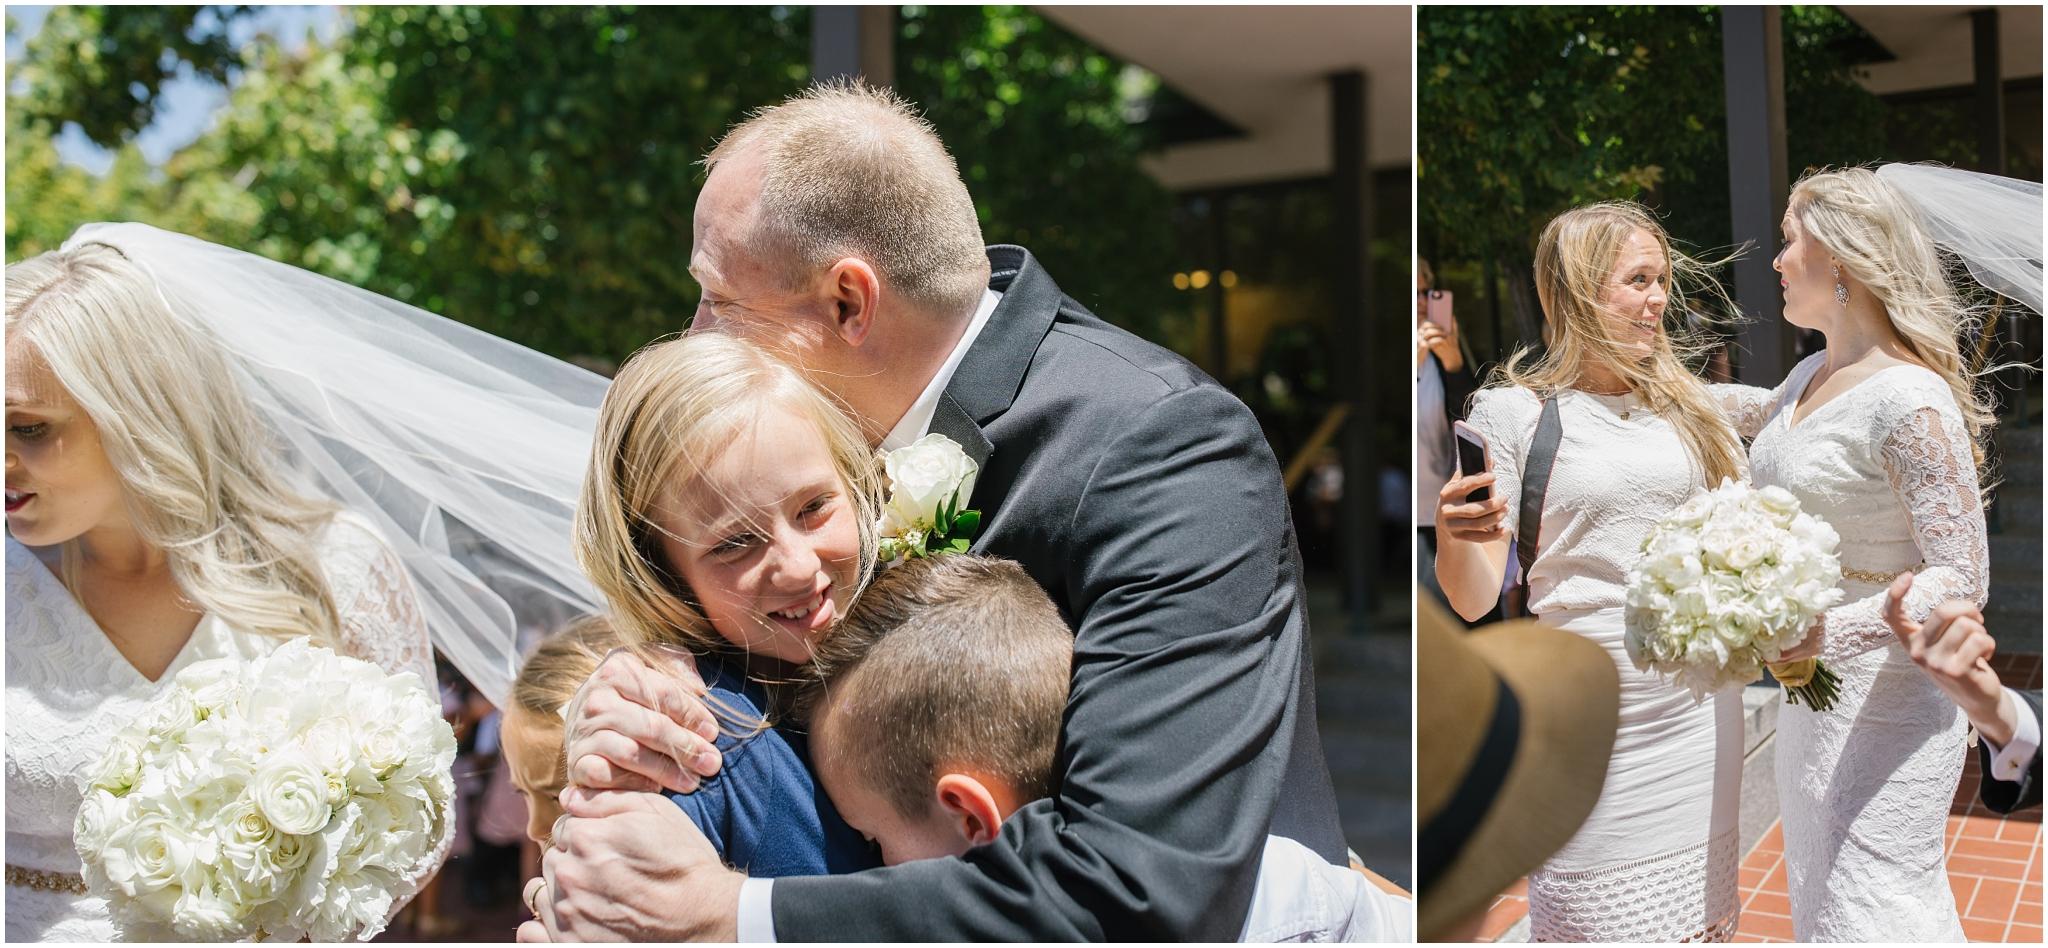 CherylandTyler-6_Lizzie-B-Imagery-Utah-Wedding-Photographer-Salt-Lake-City-Temple-Wells-Fargo-Building-Reception.jpg